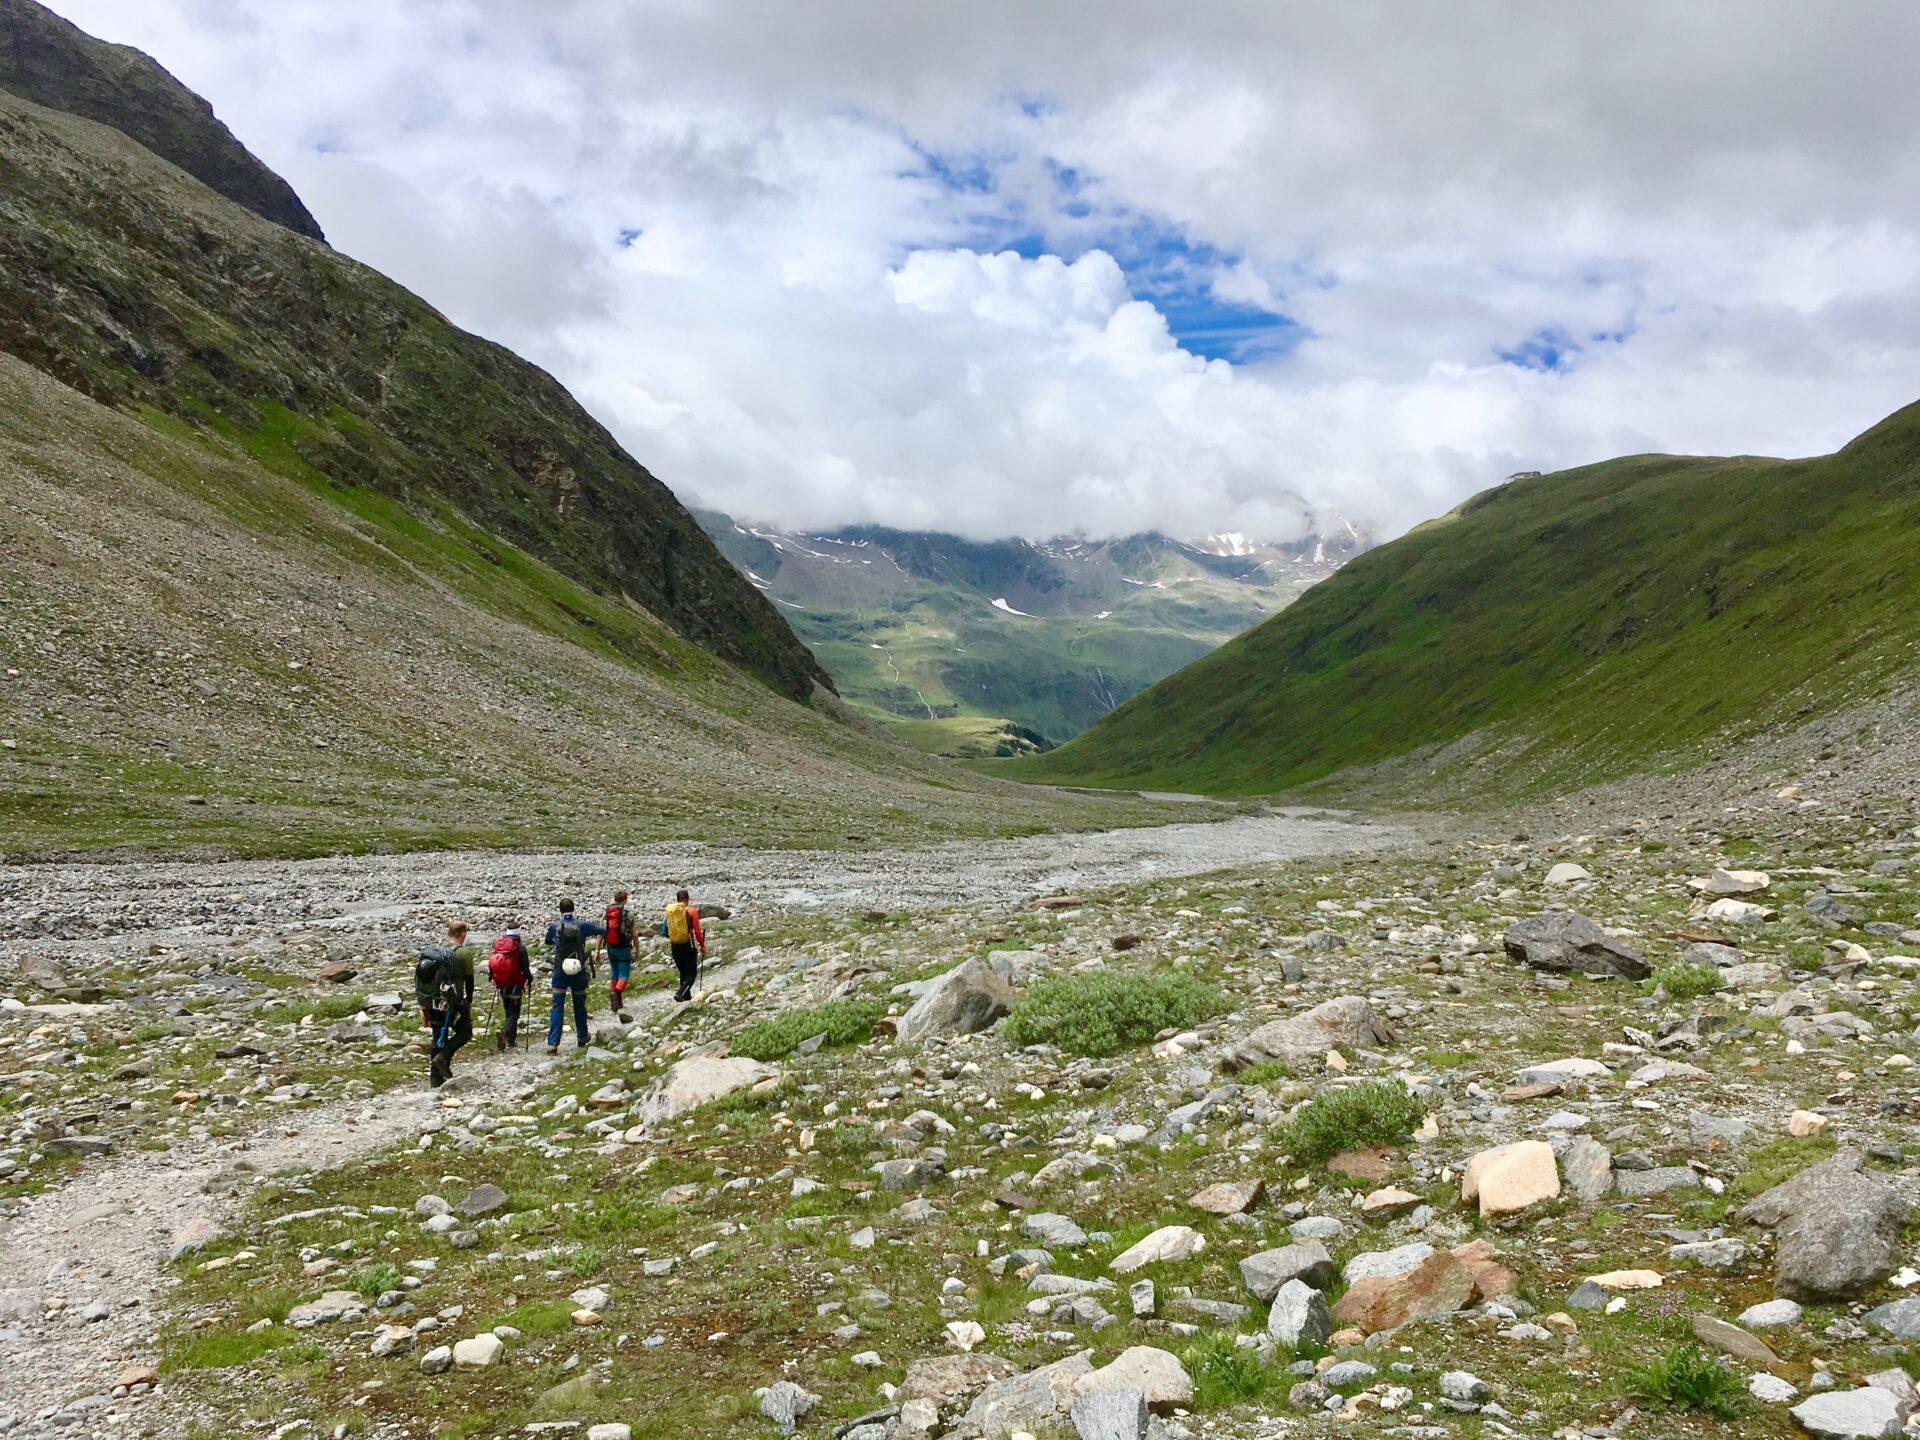 Klettersteig Obergurgl : Imster klettersteig maldonkopf aktivsport alpin